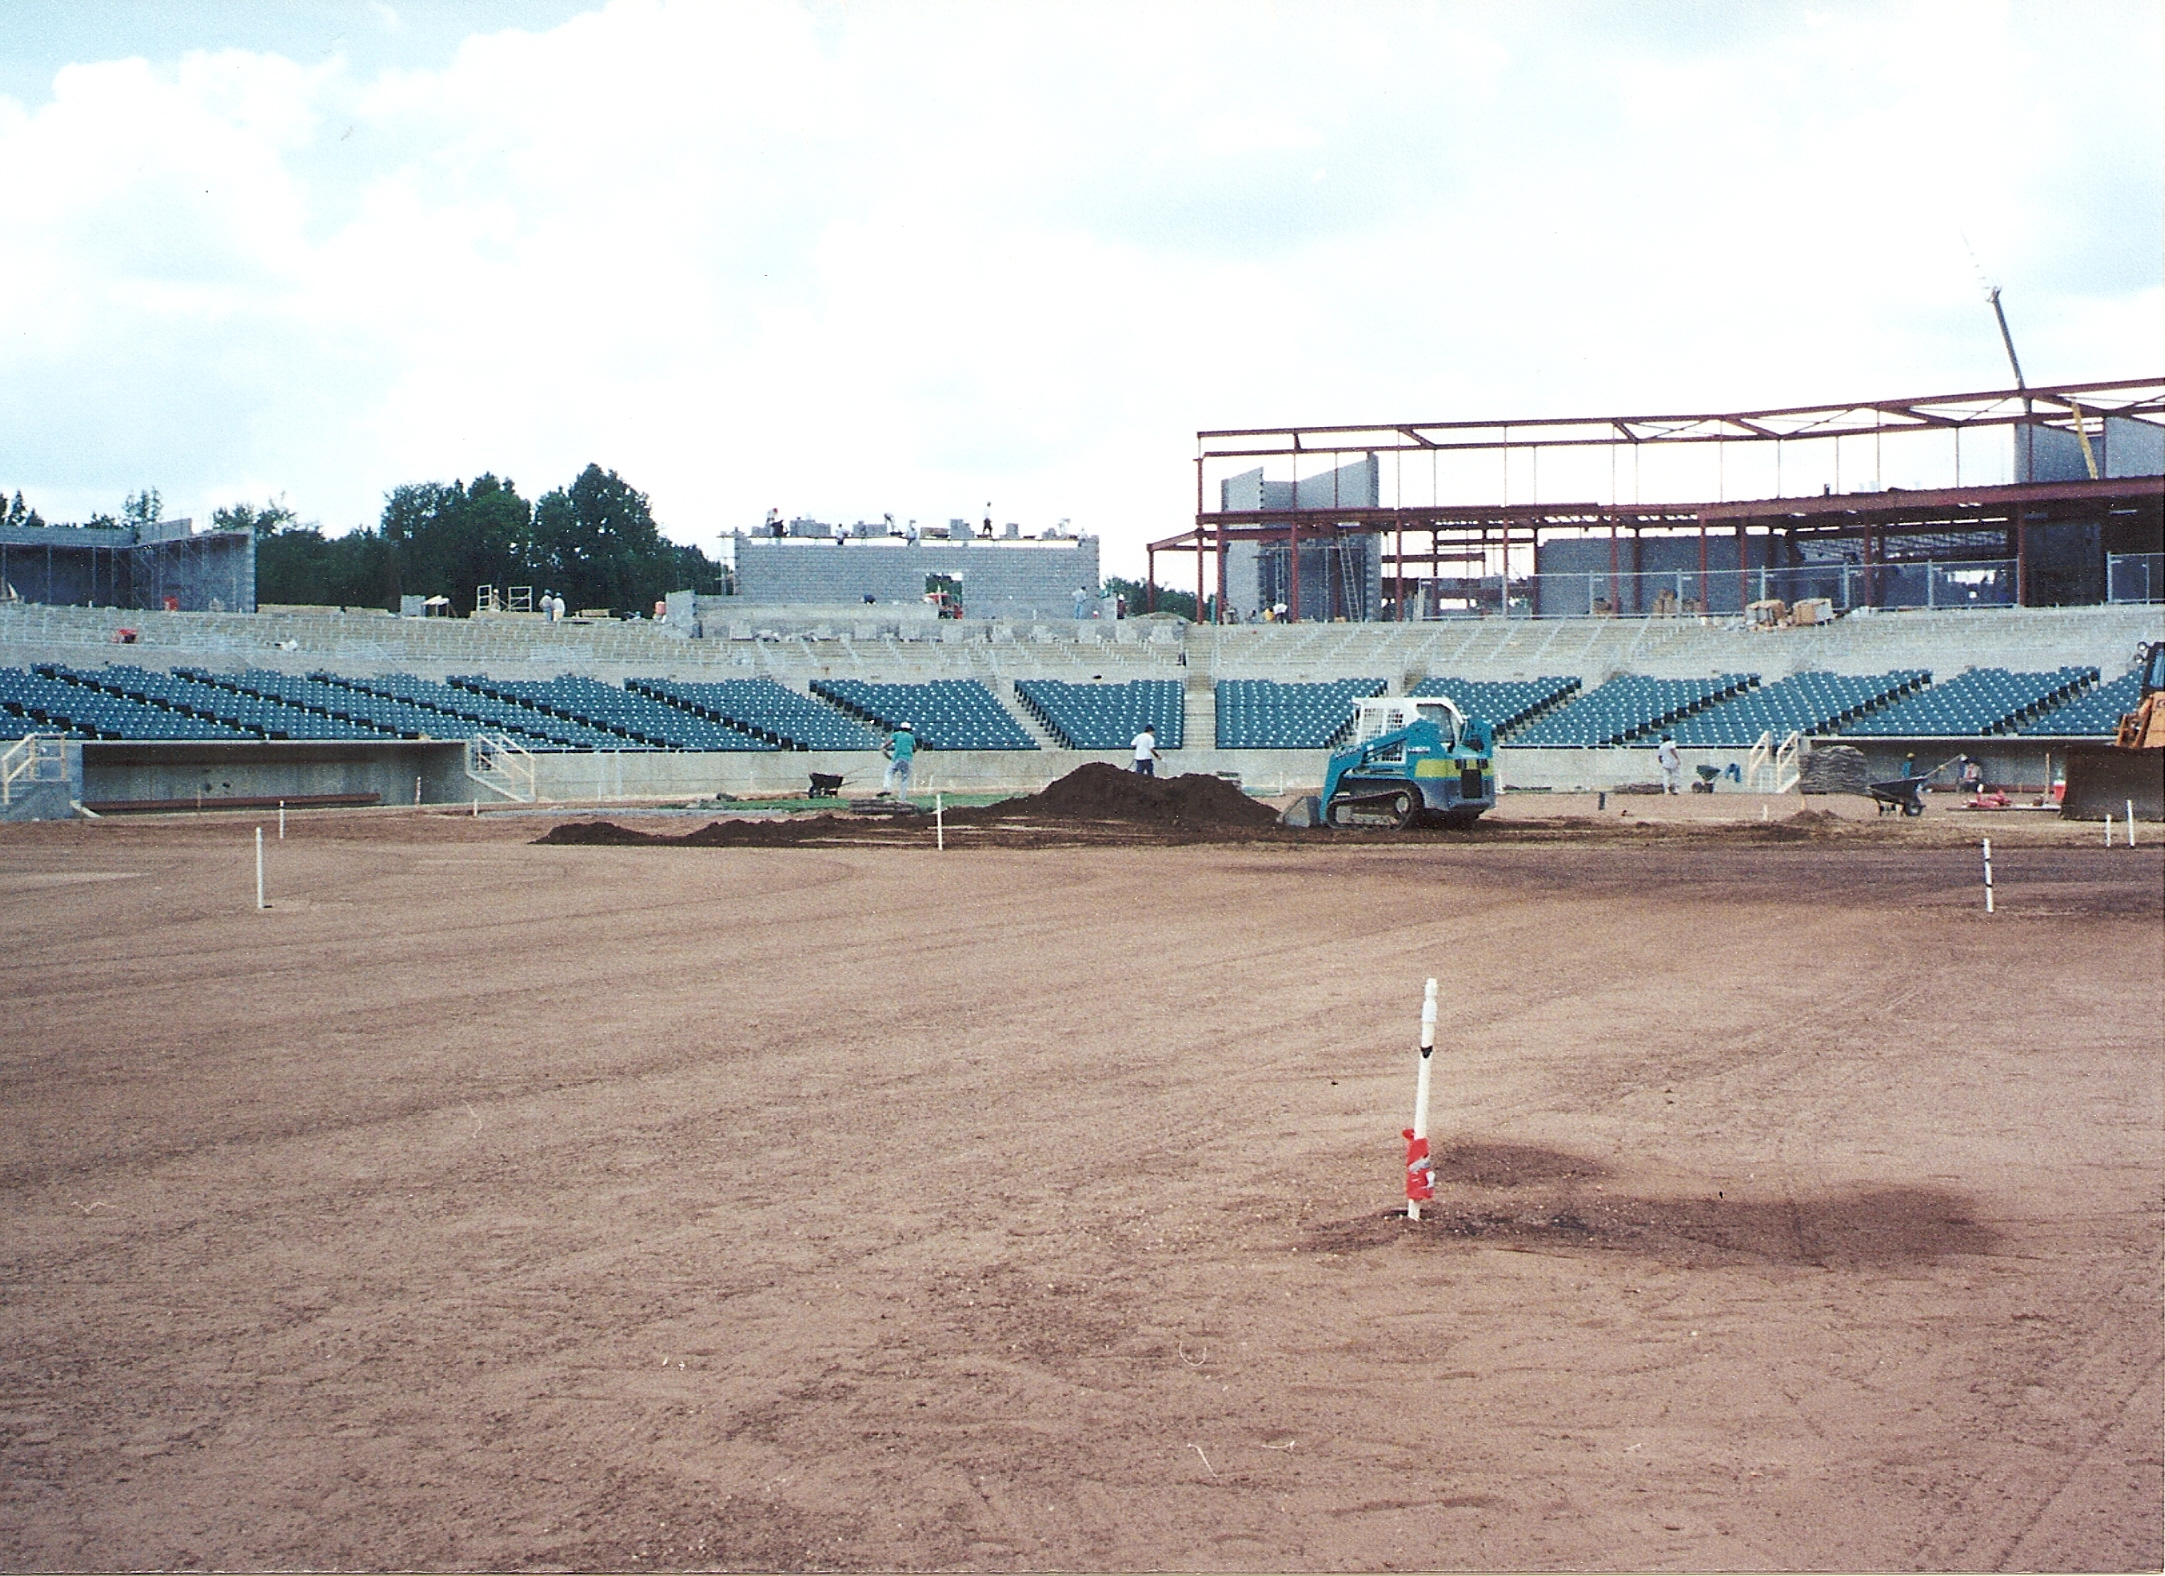 Prince George's Stadium